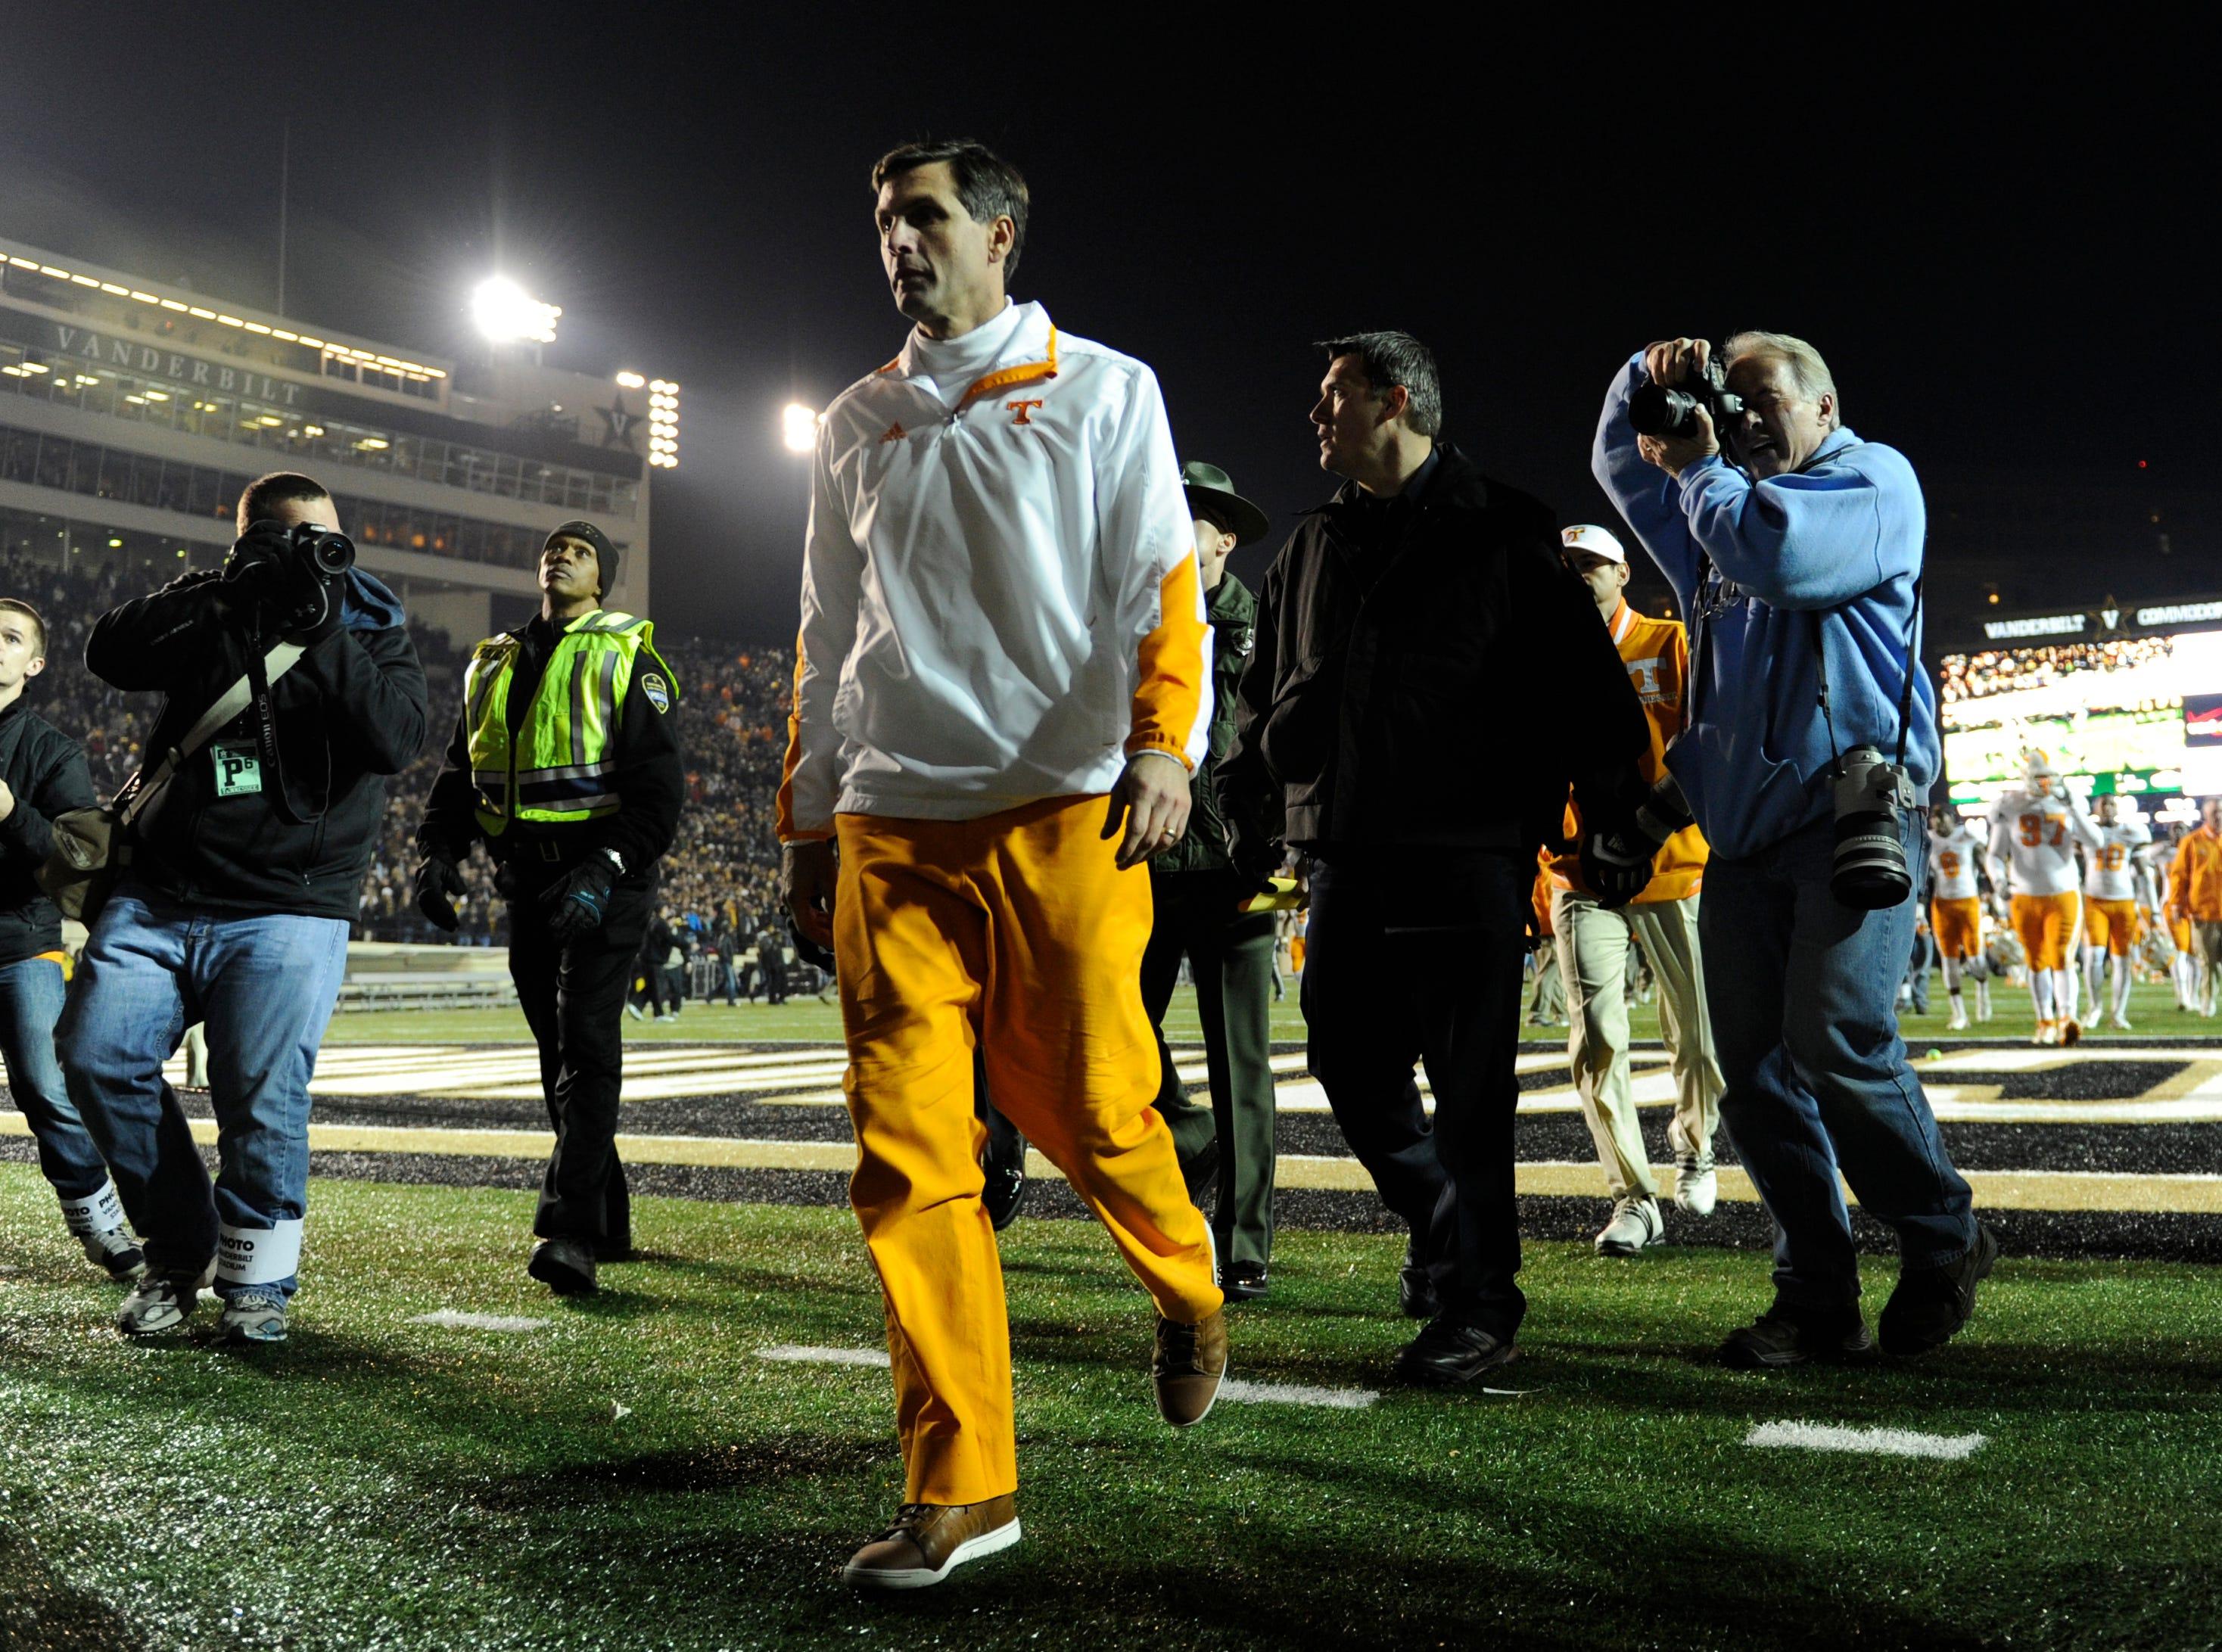 Tennessee head coach Derek Dooley leaves the field after the loss to Vanderbilt at Vanderbilt Stadium in Nashville on Saturday, Nov. 17, 2012. Vanderbilt defeated Tennessee 41-18.